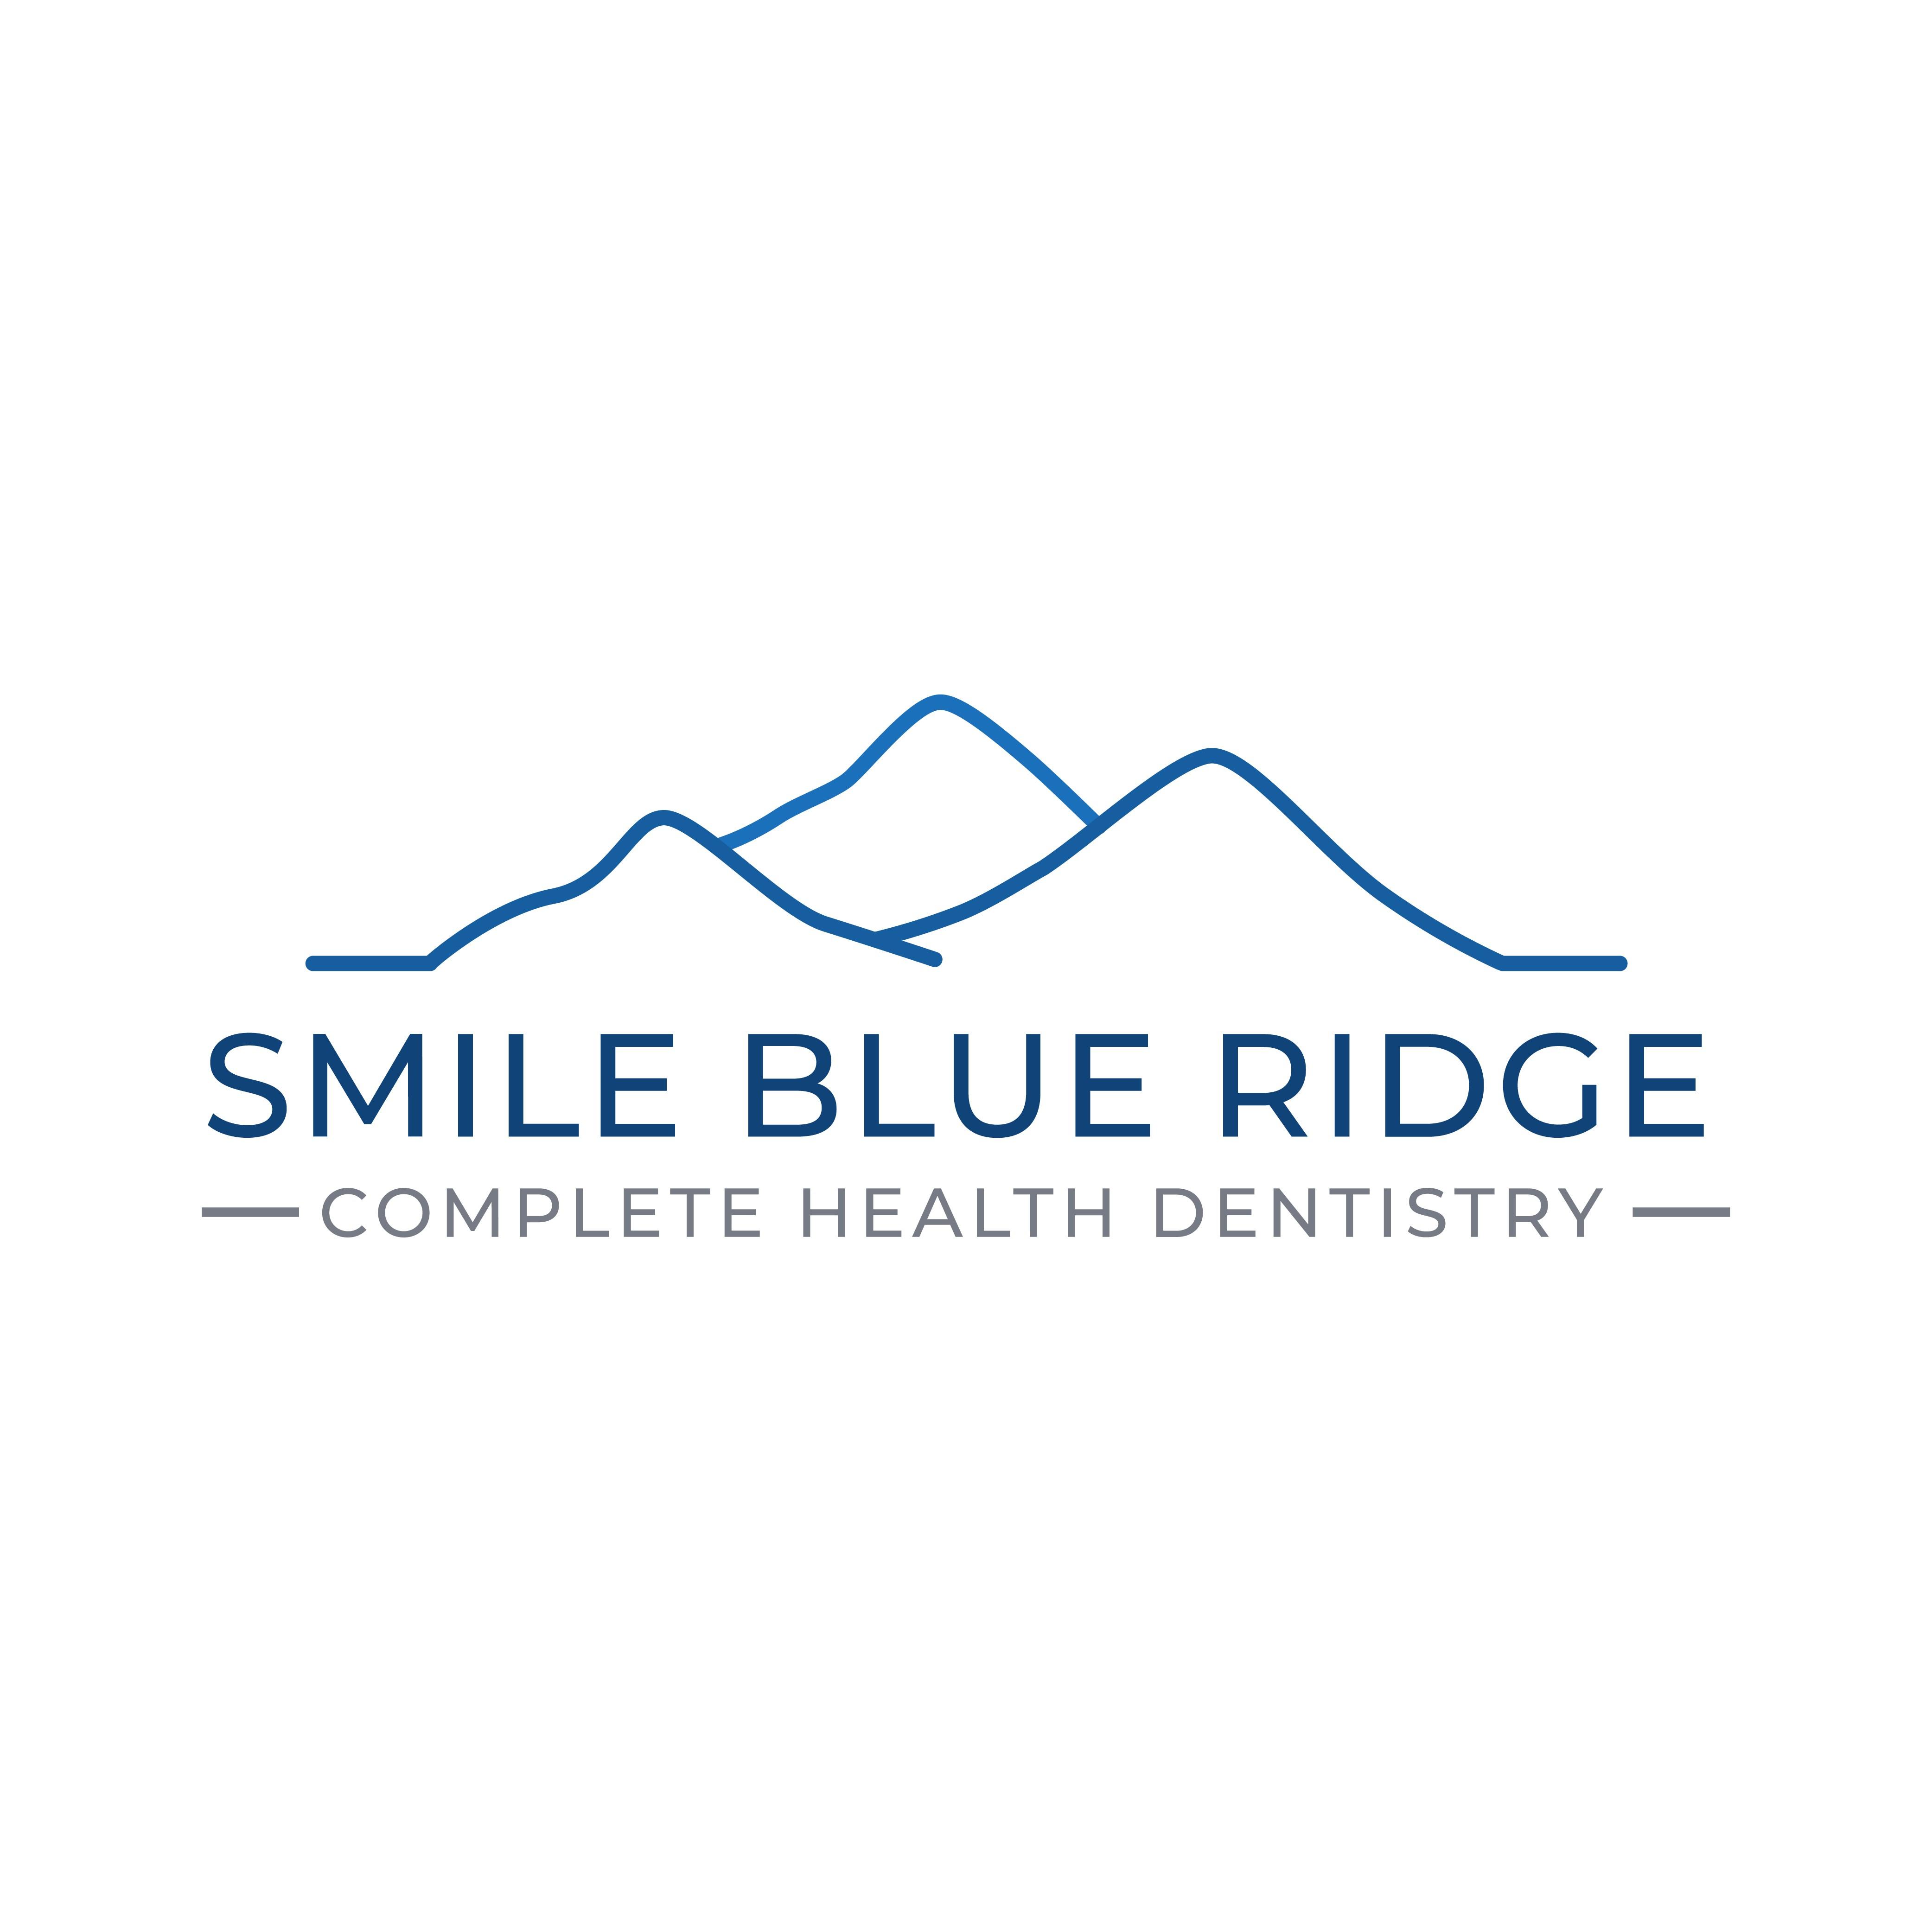 Smile Blue Ridge Dental Practice Logo